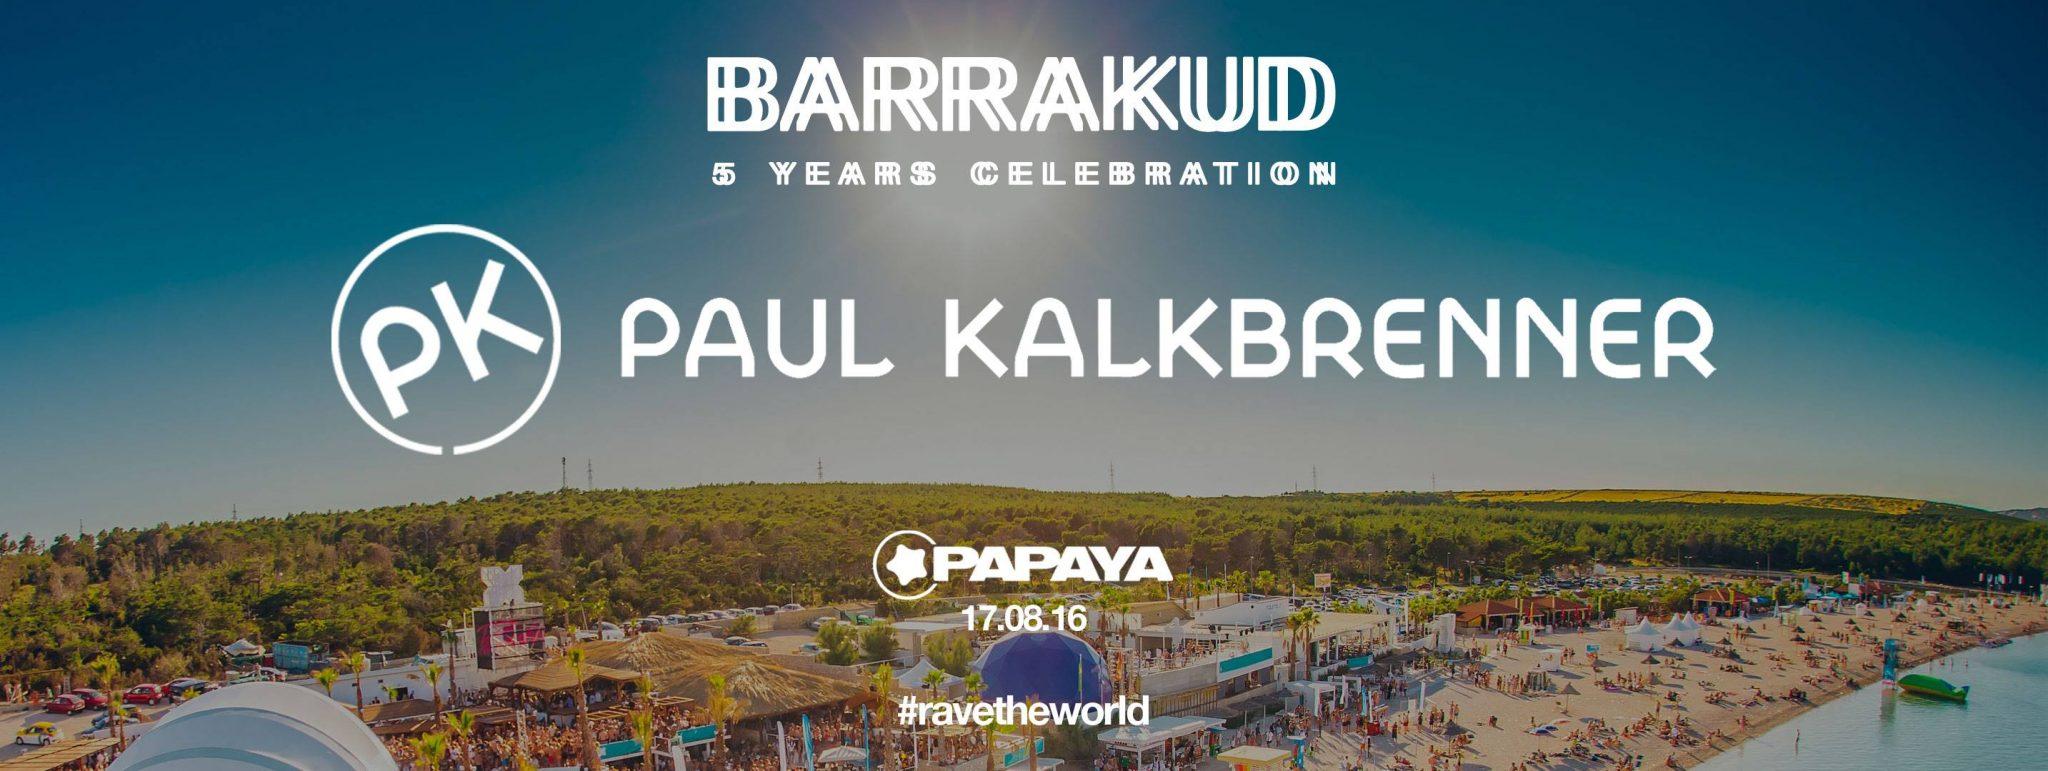 Barrakud Festival 2016